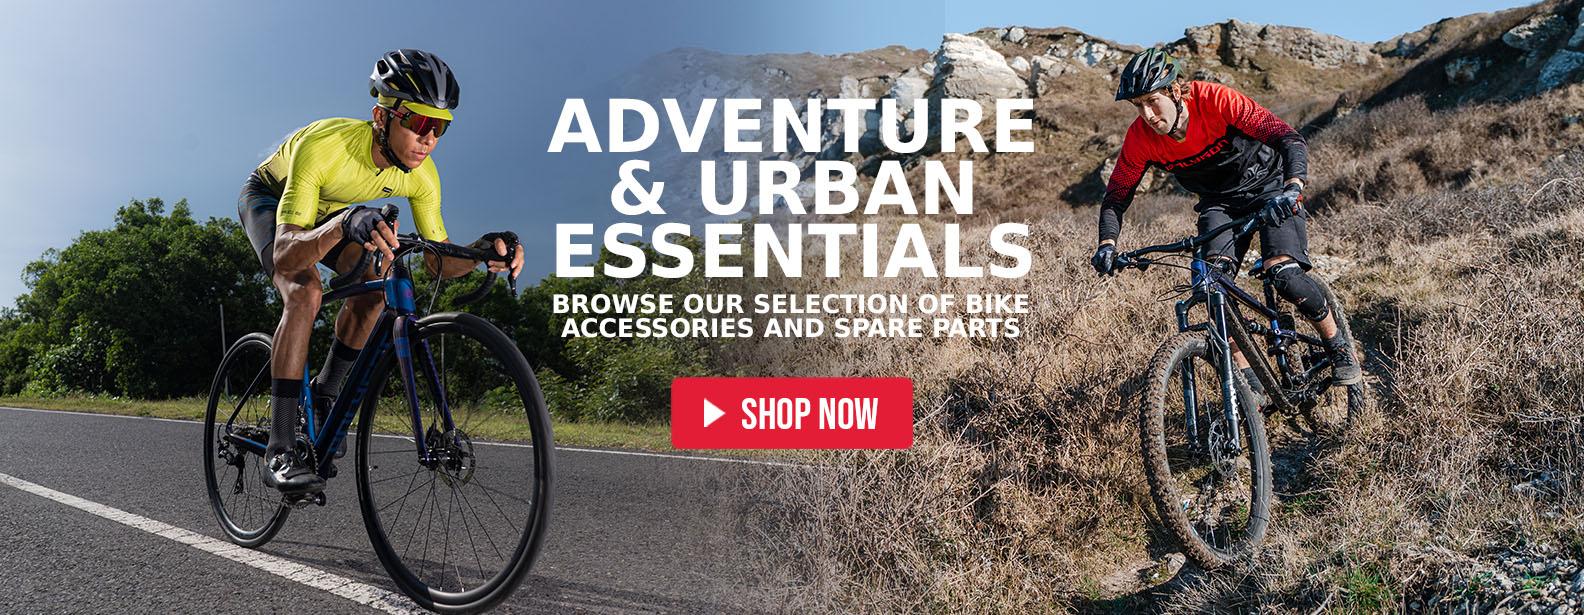 Adventure & Urban Racing Essentials